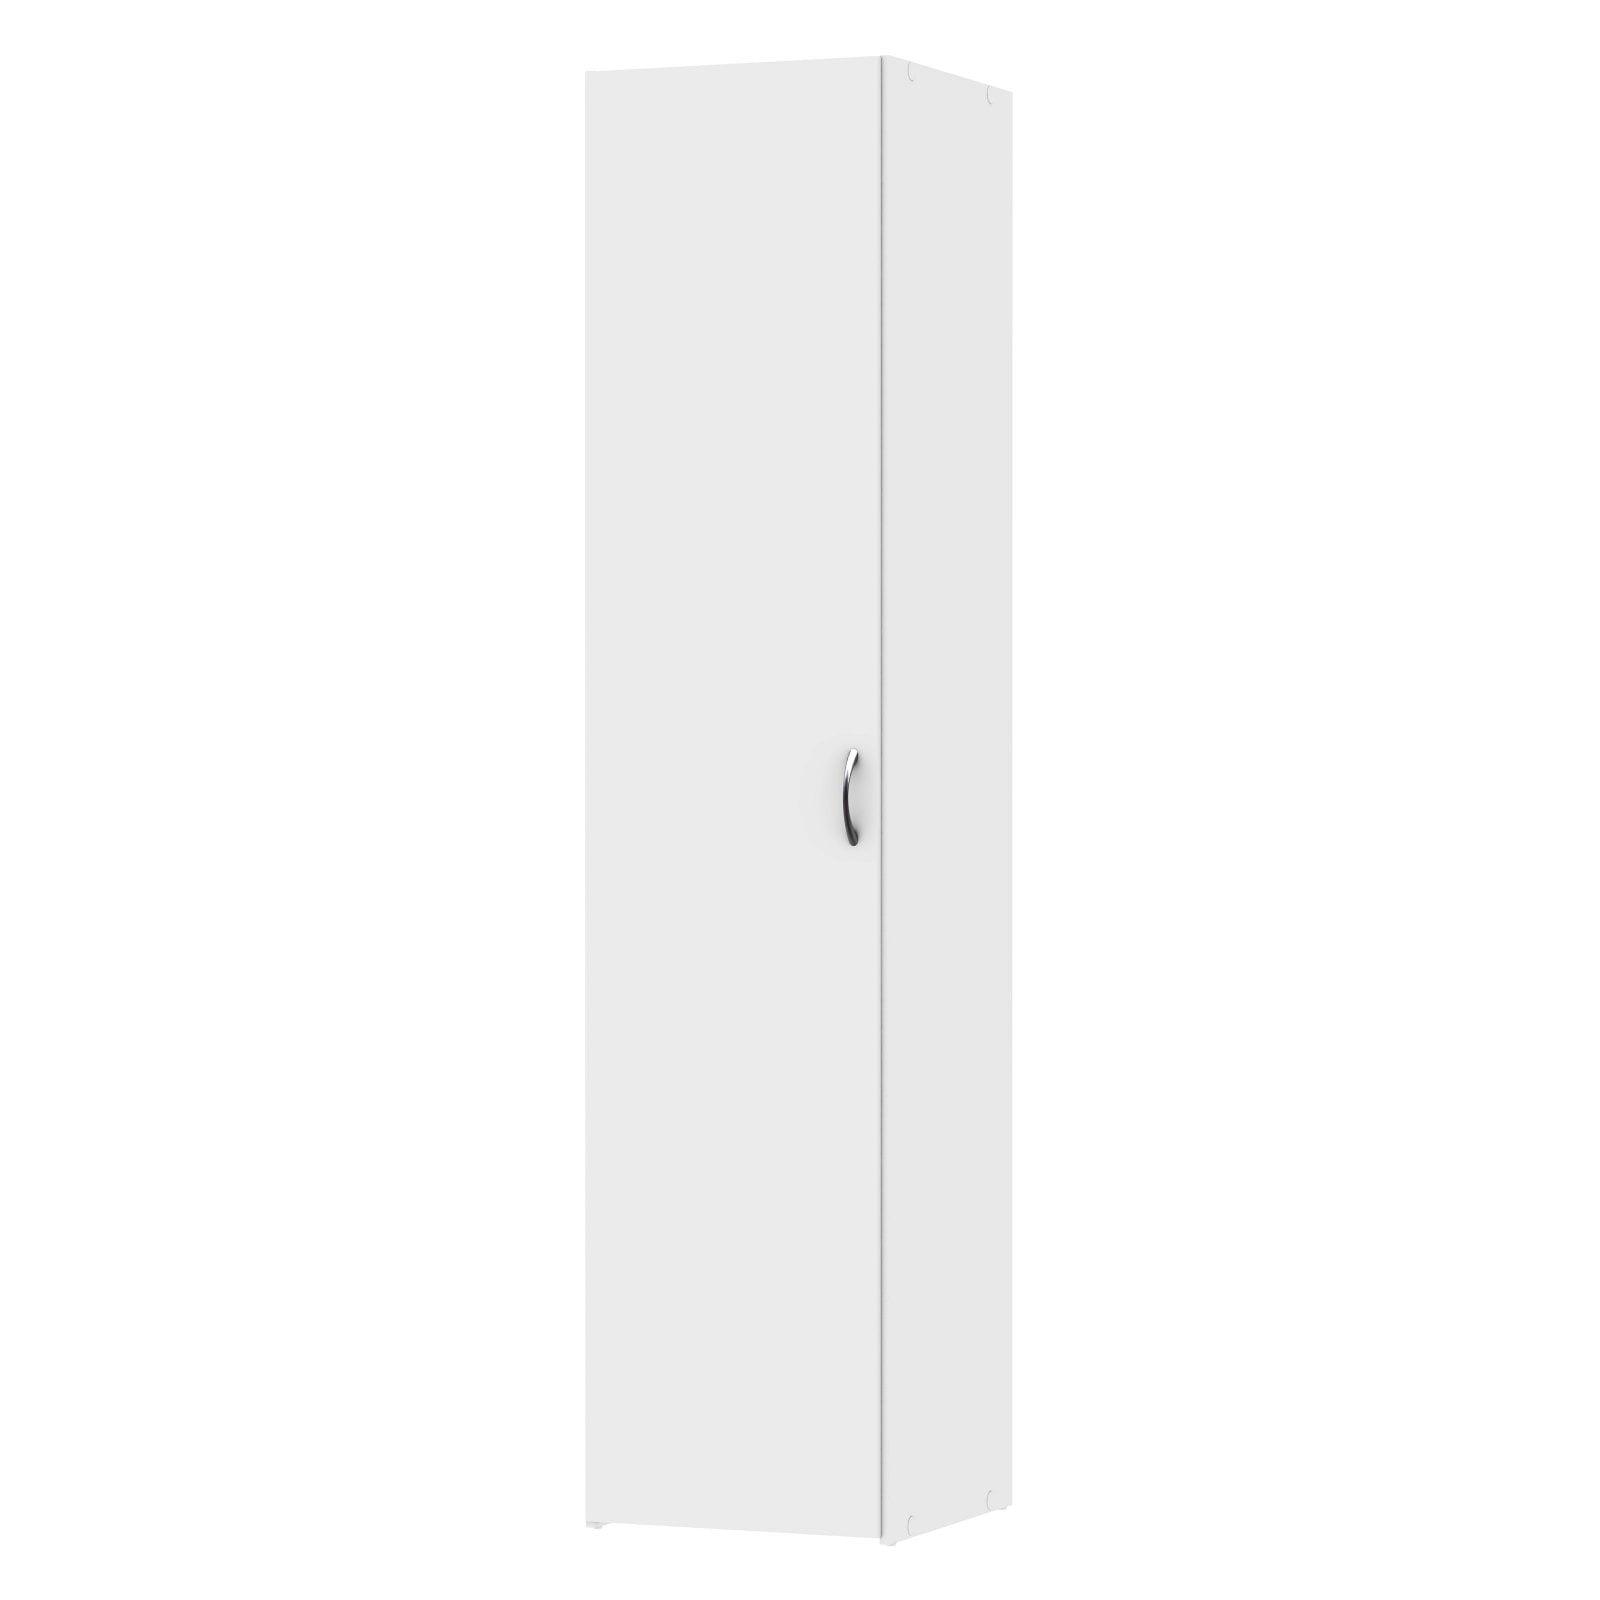 Space Wardrobe with 1 Door; White